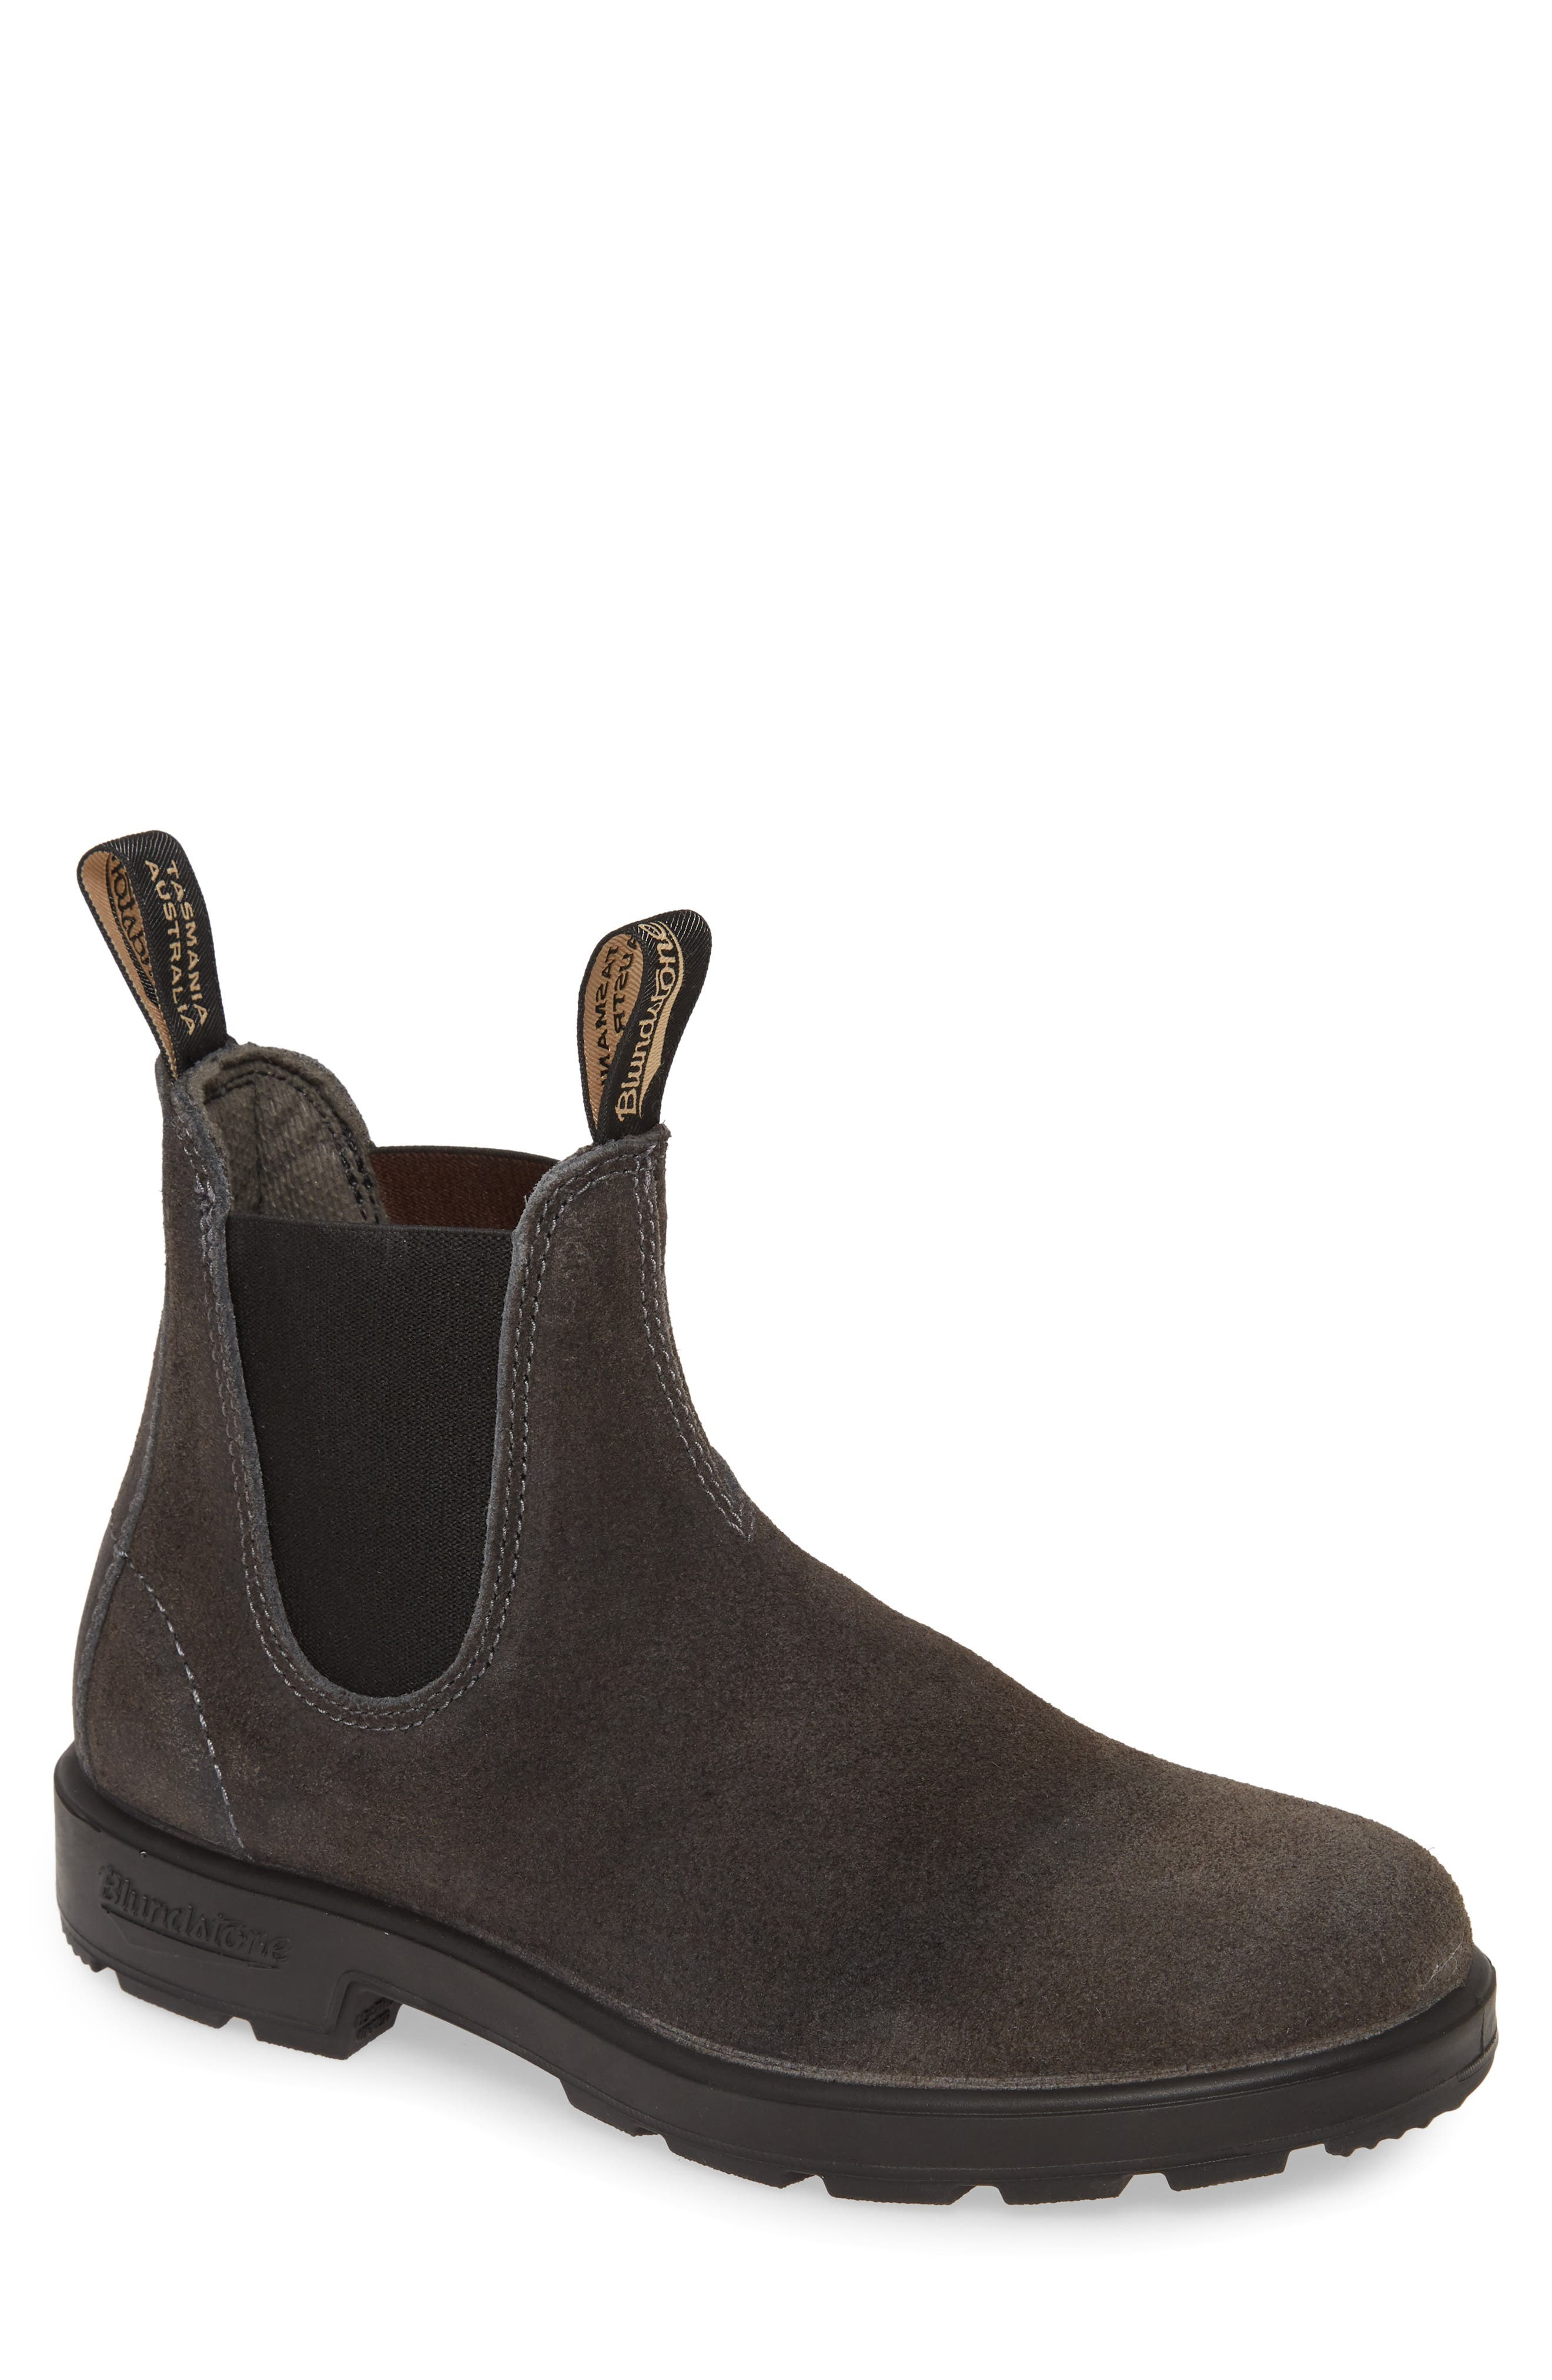 Blundstone Original Series Chelsea Boot